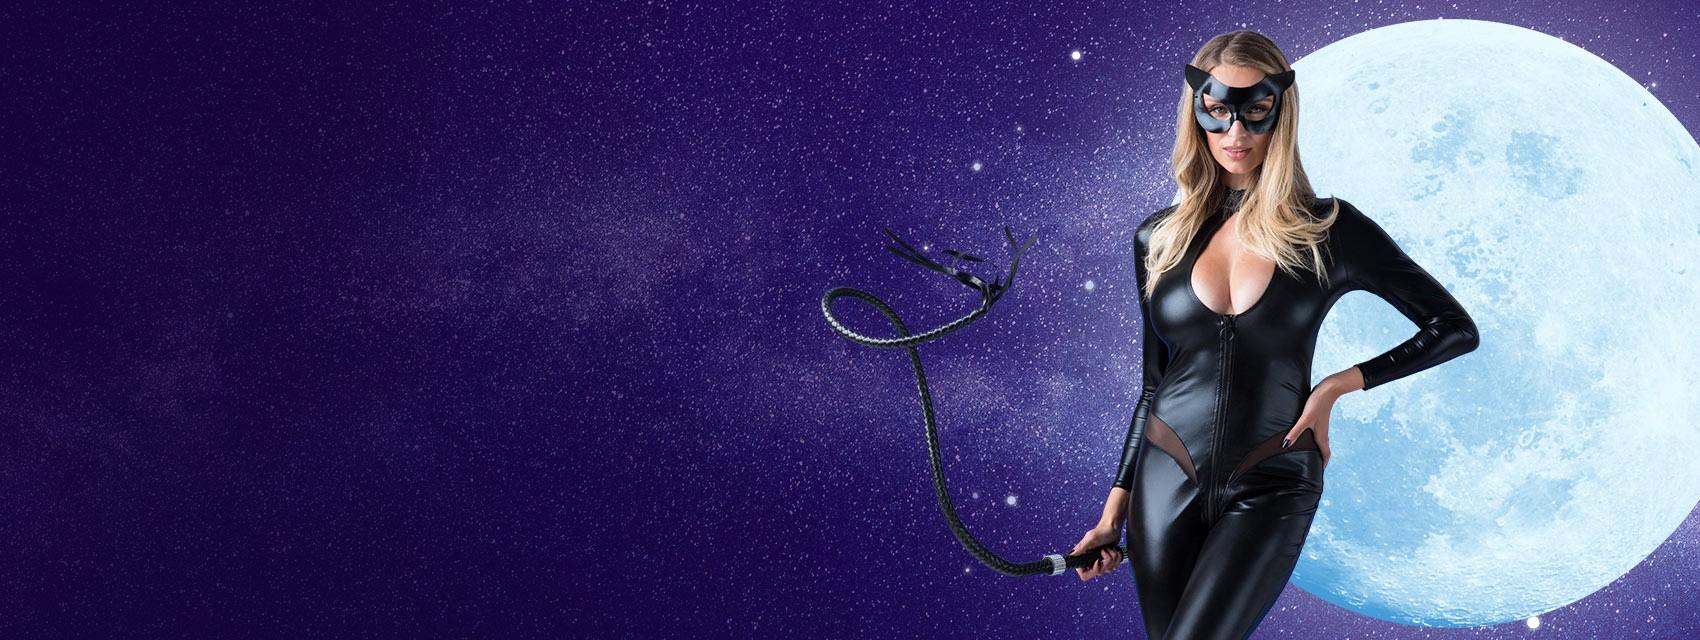 CAAN-Carousel-desktop---Catwoman_1